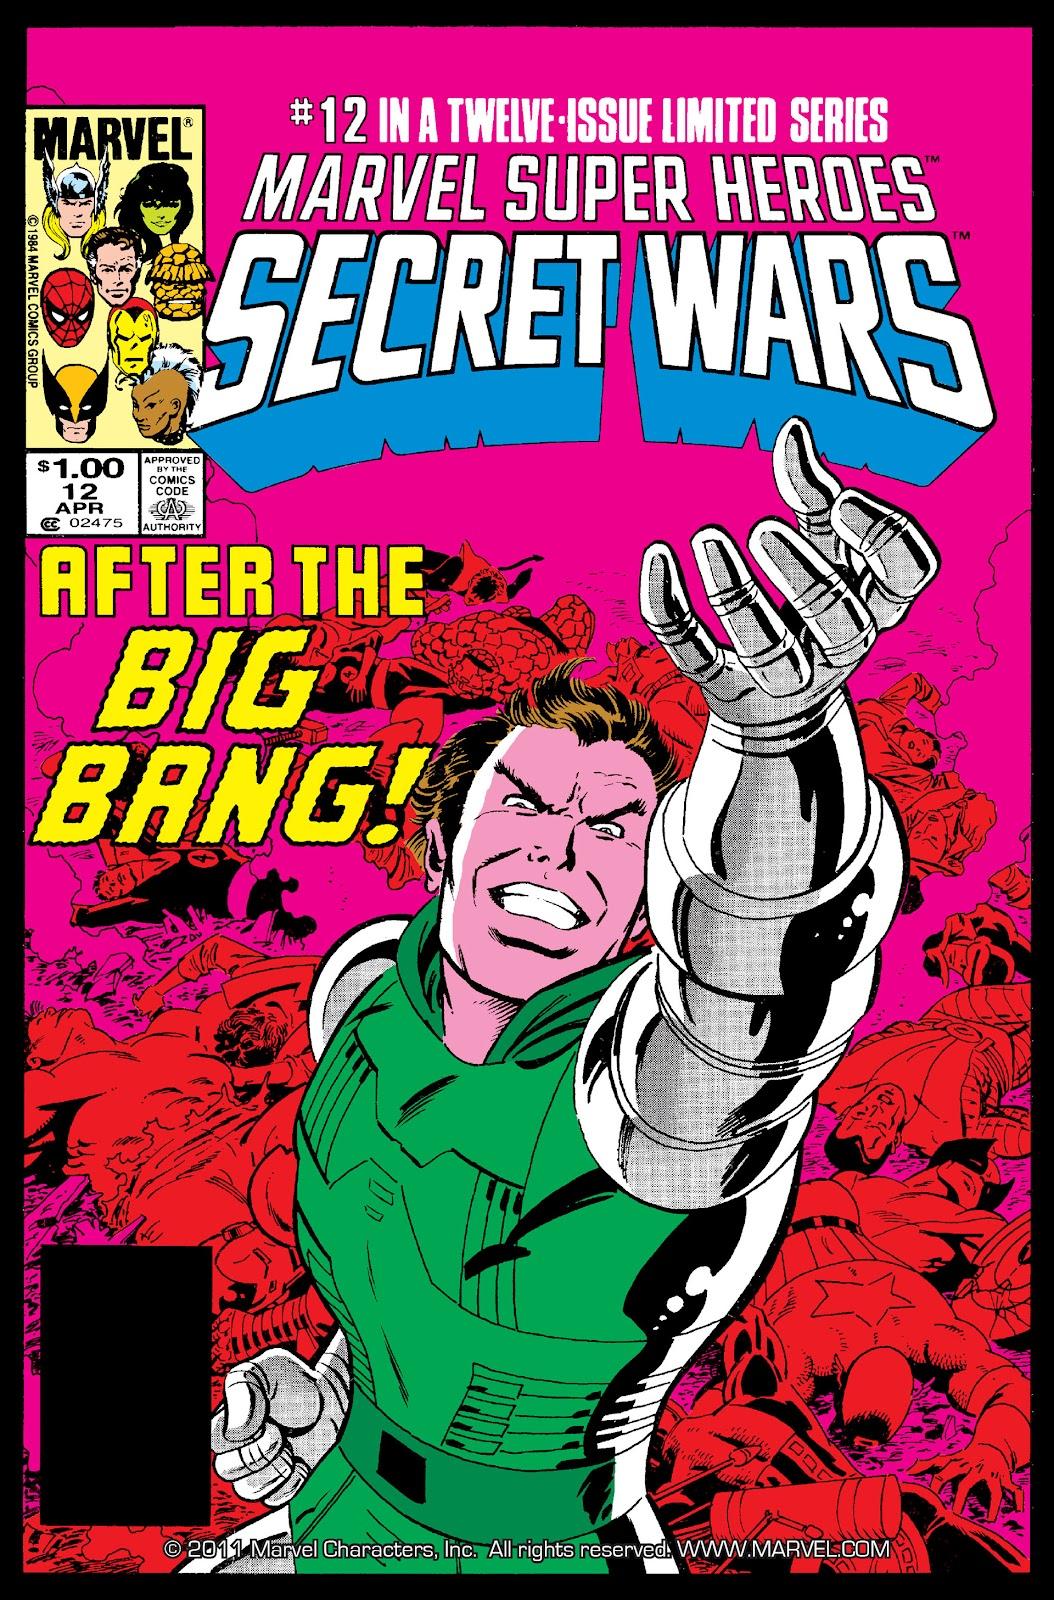 Marvel Super Heroes Secret Wars (1984) issue 12 - Page 1